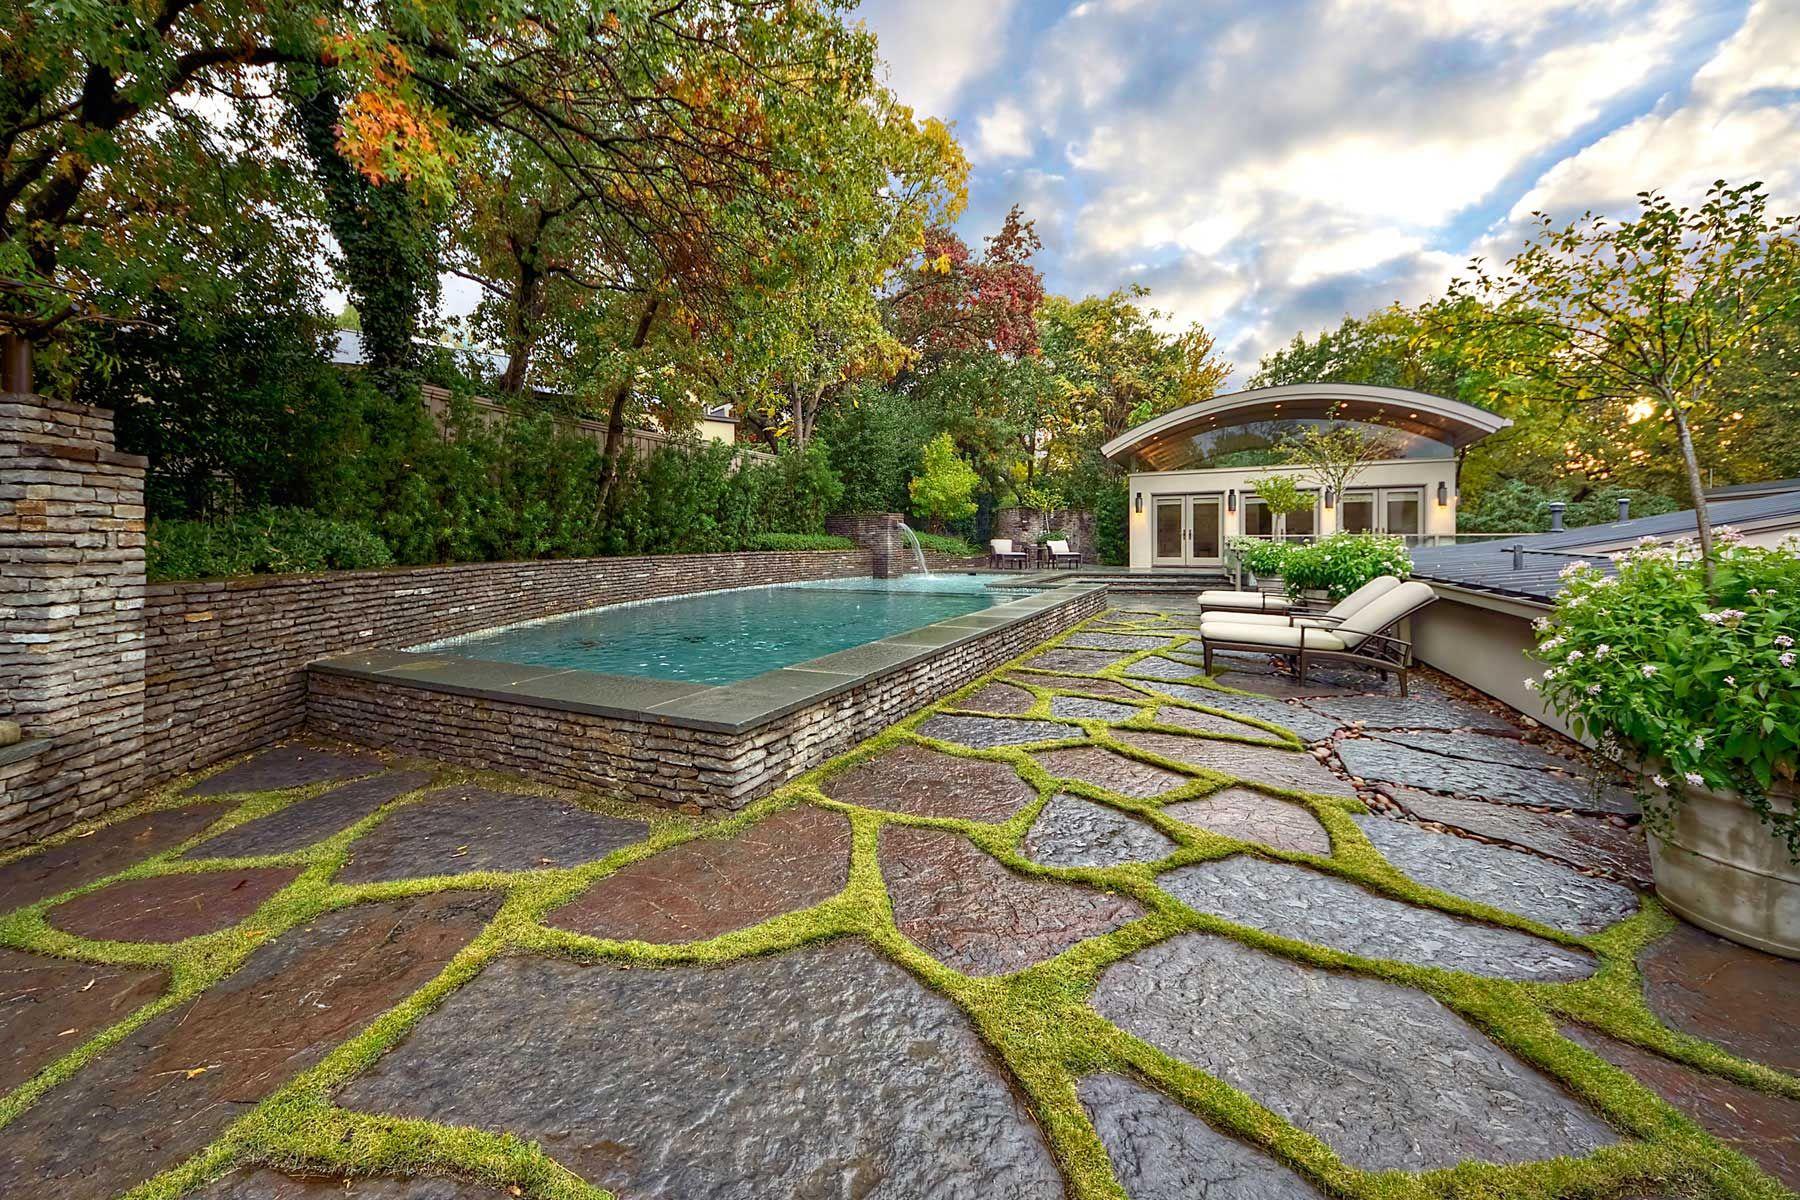 Residential Landscape Design Salary